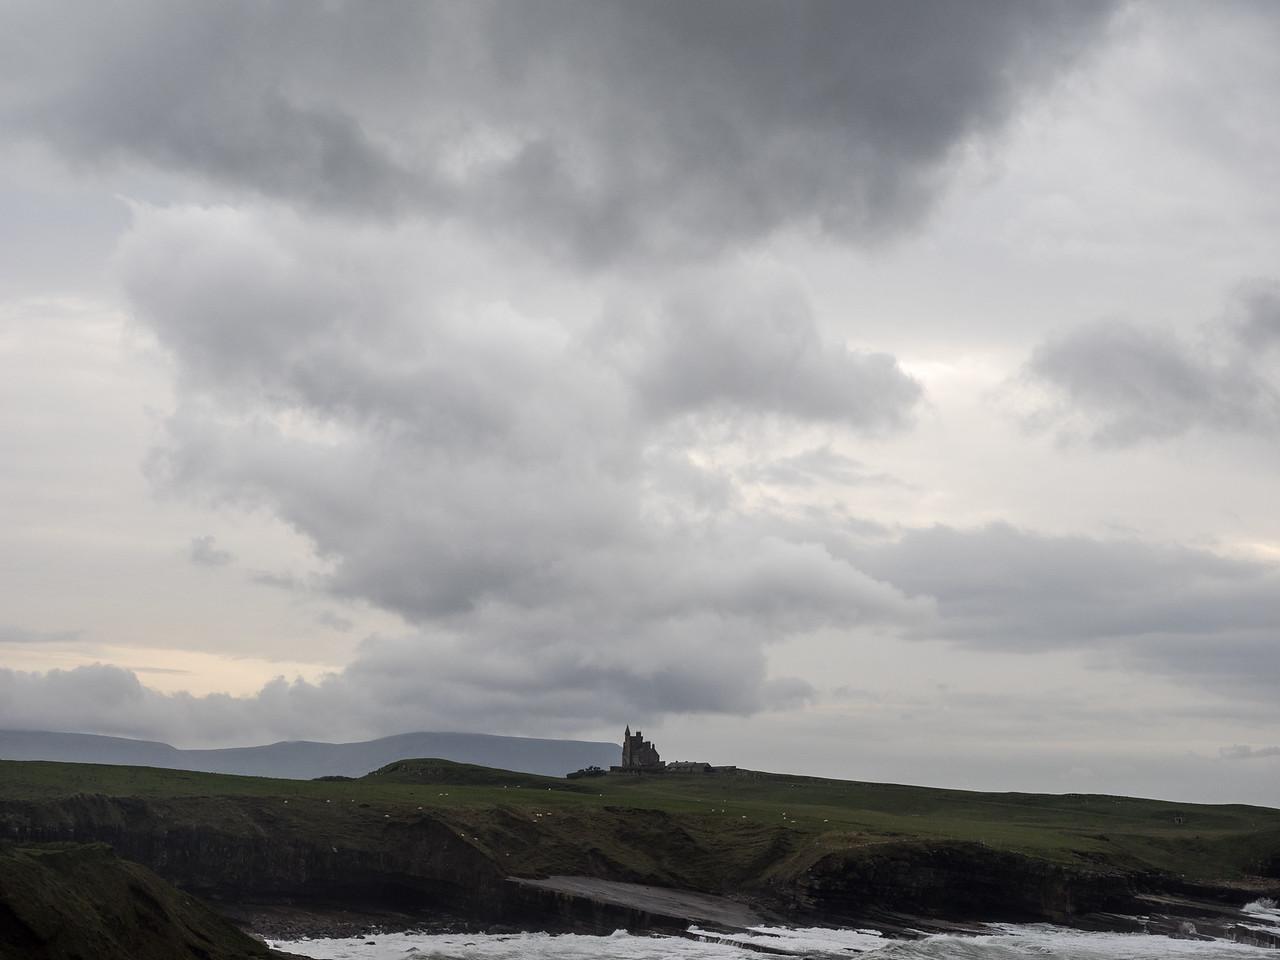 Mountbatten's castle, Classiebawn, on the horizon.